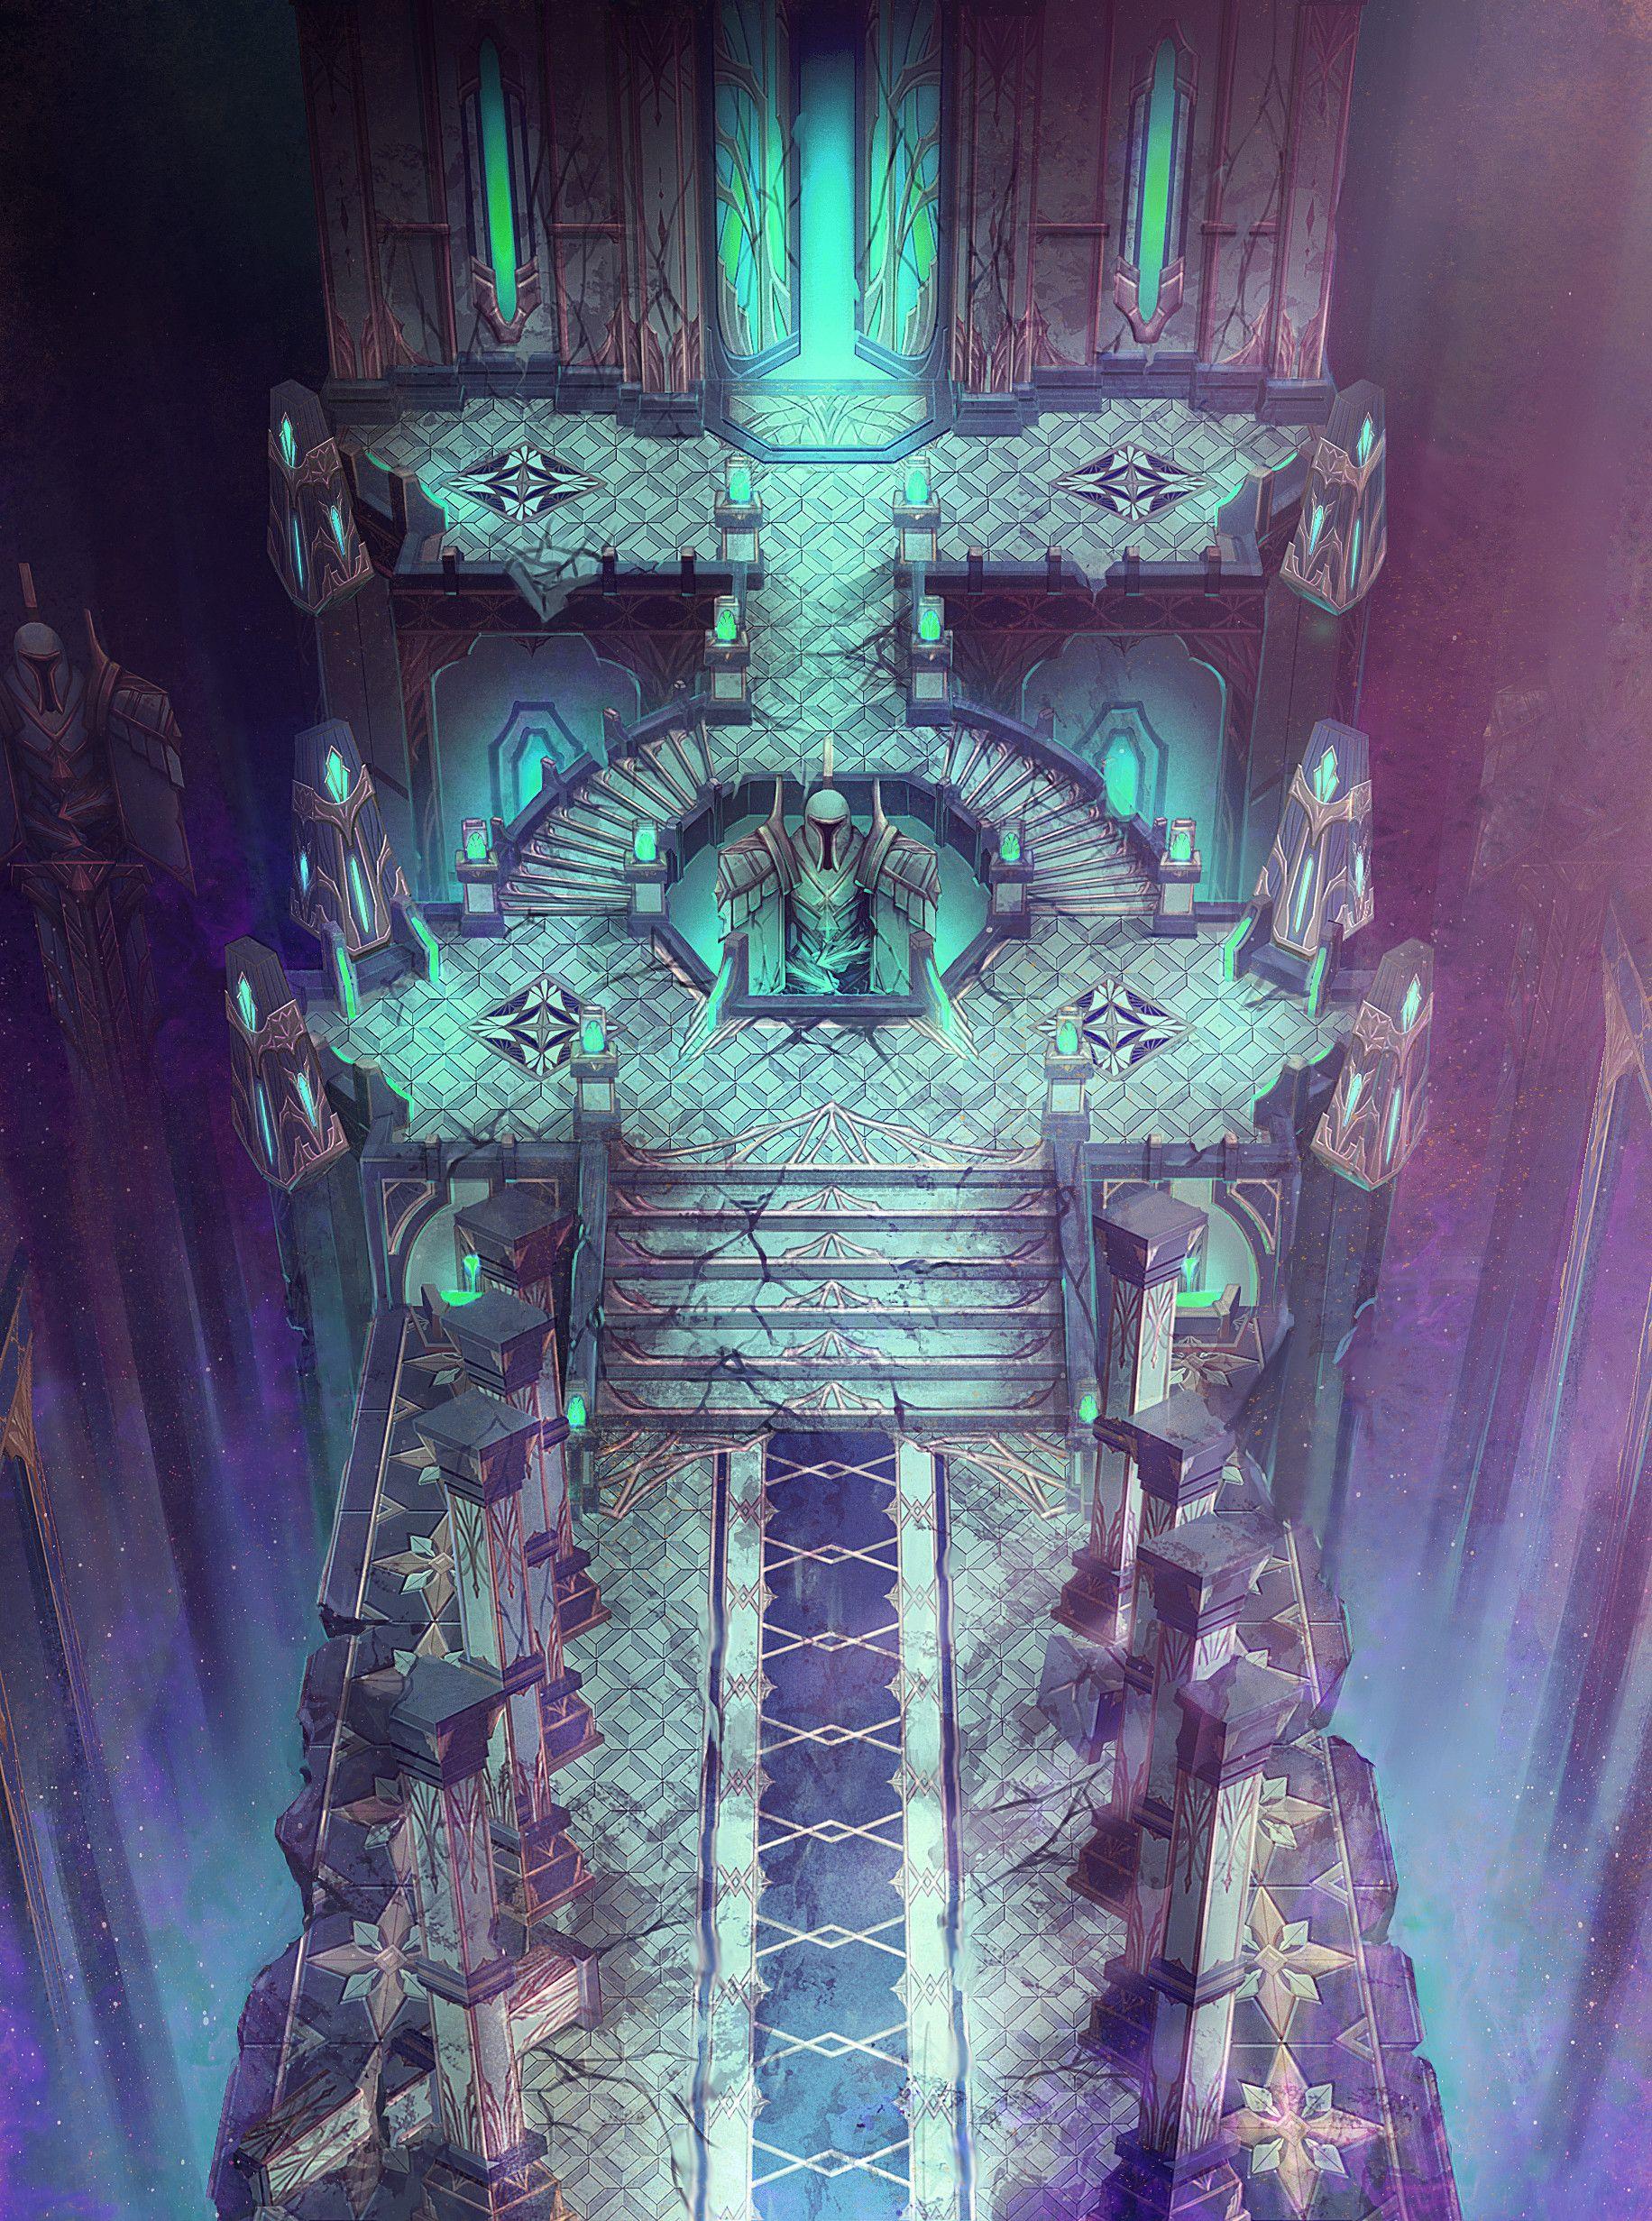 ArtStation - 'Blade' Concept Art - Theme04. Elysion(Temple of Light), Arthur Lee